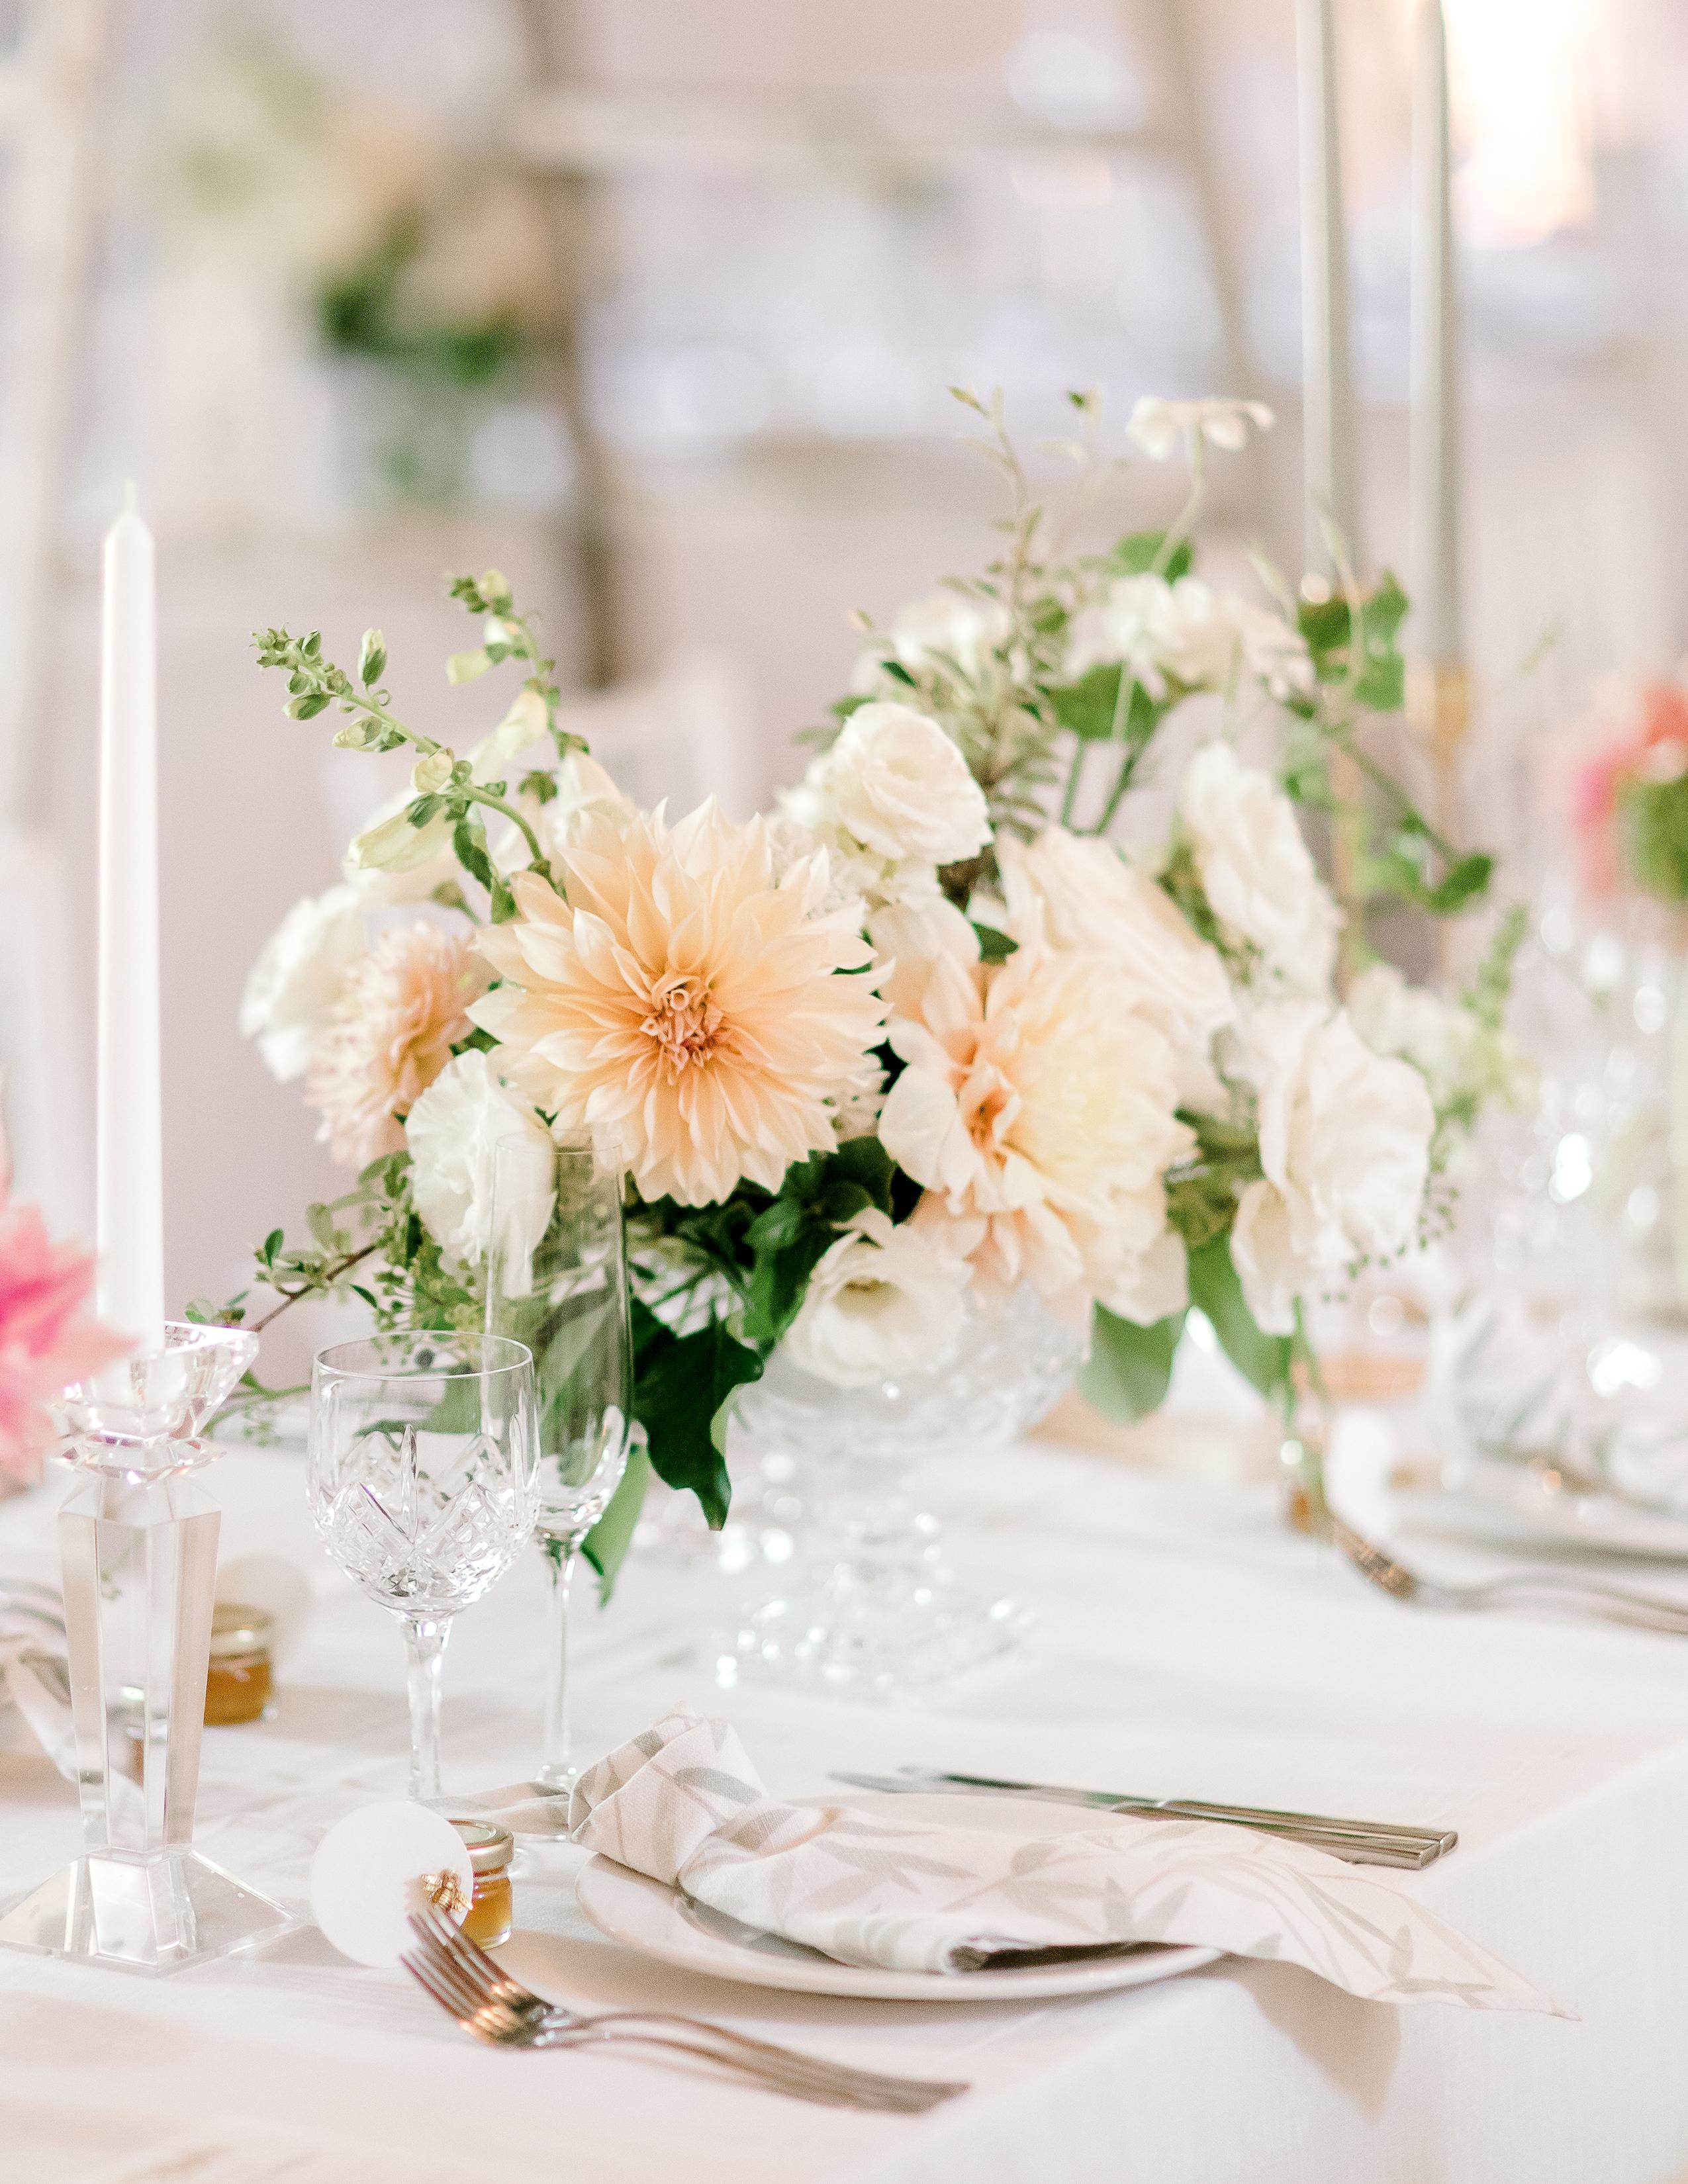 rorisang stephen wedding reception centerpiece